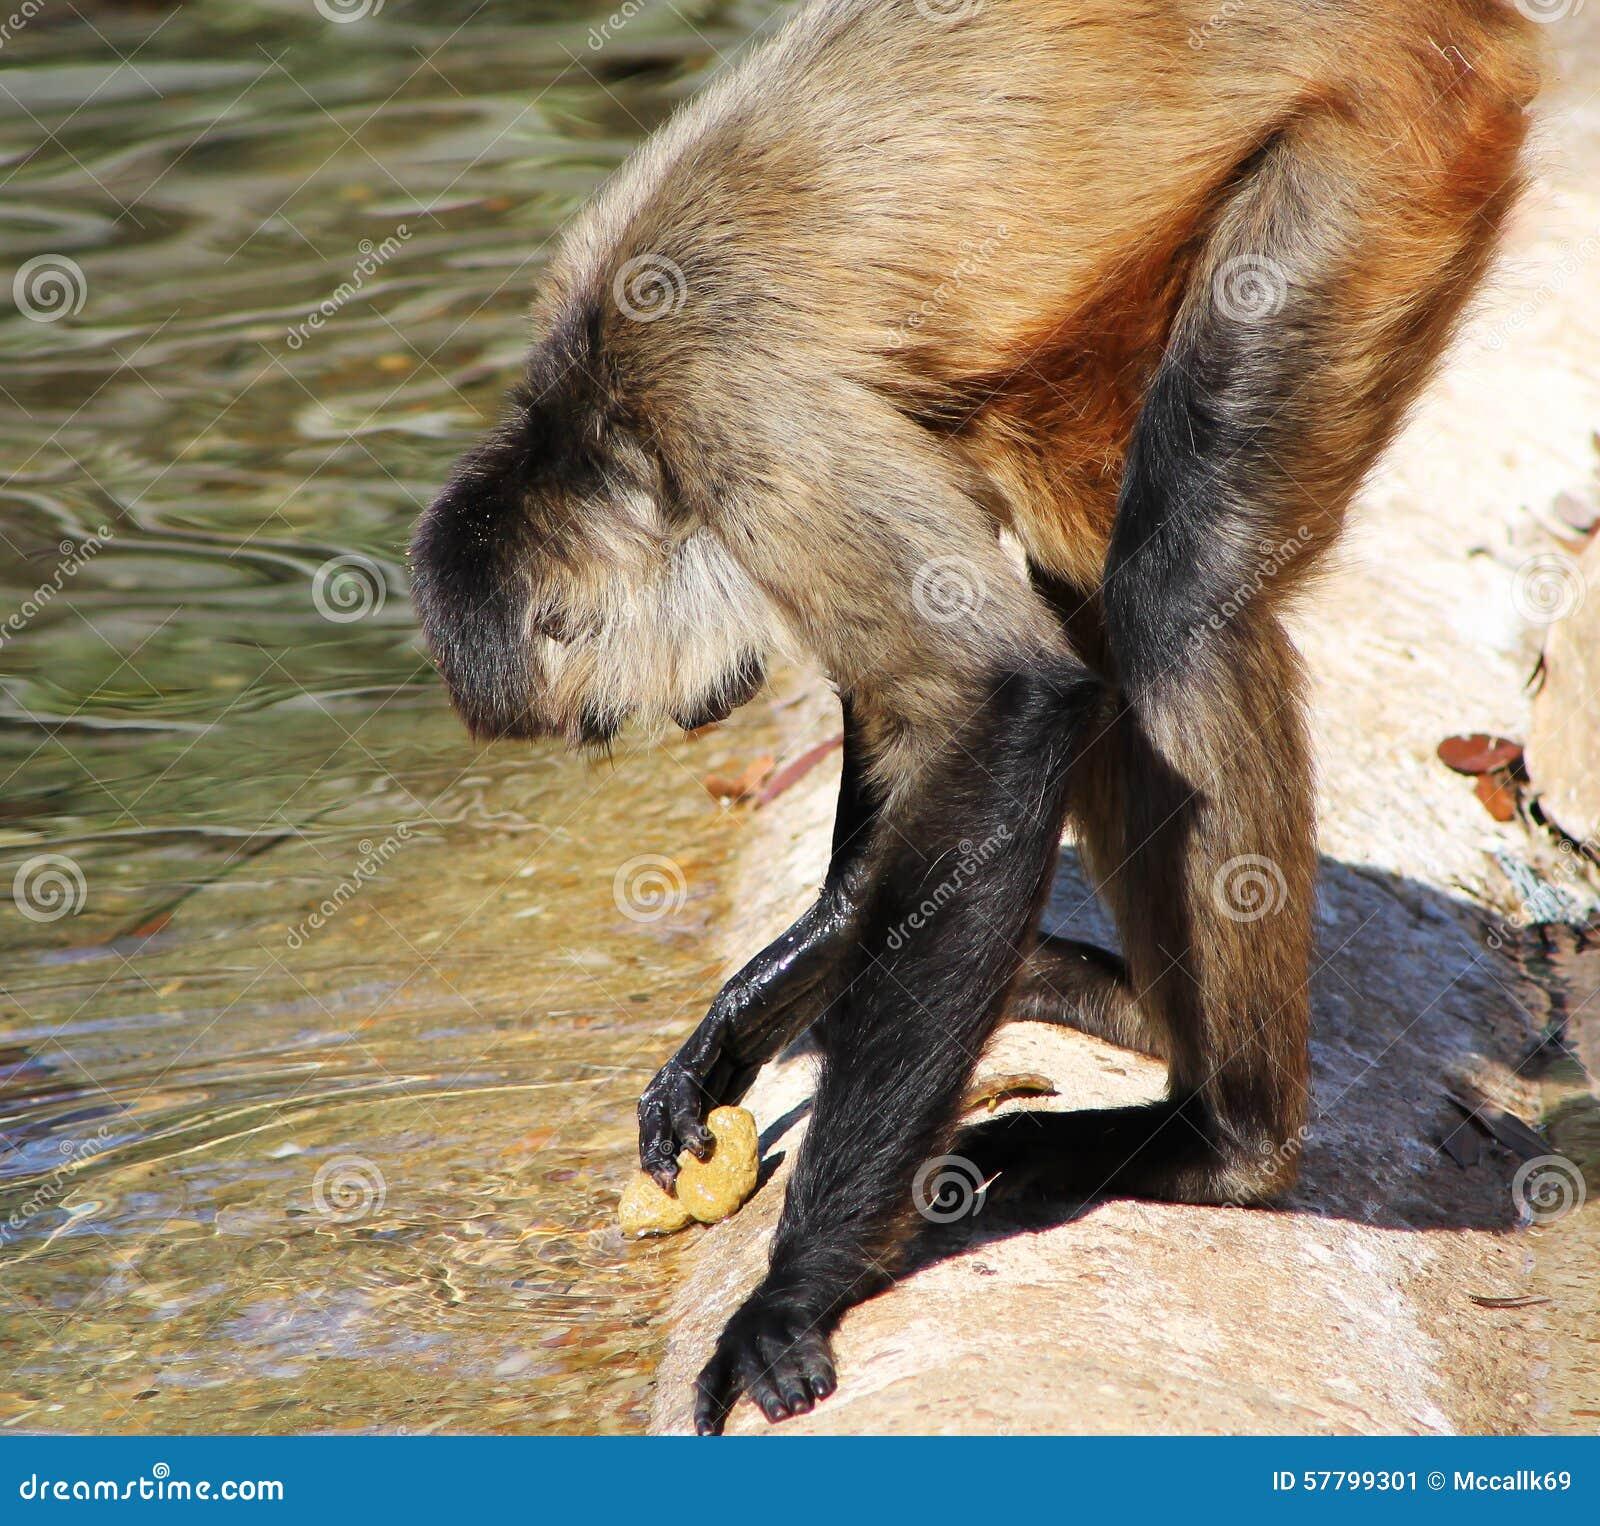 Spider Utensil: Spider Monkey Washing Rock Utensil Stock Photo